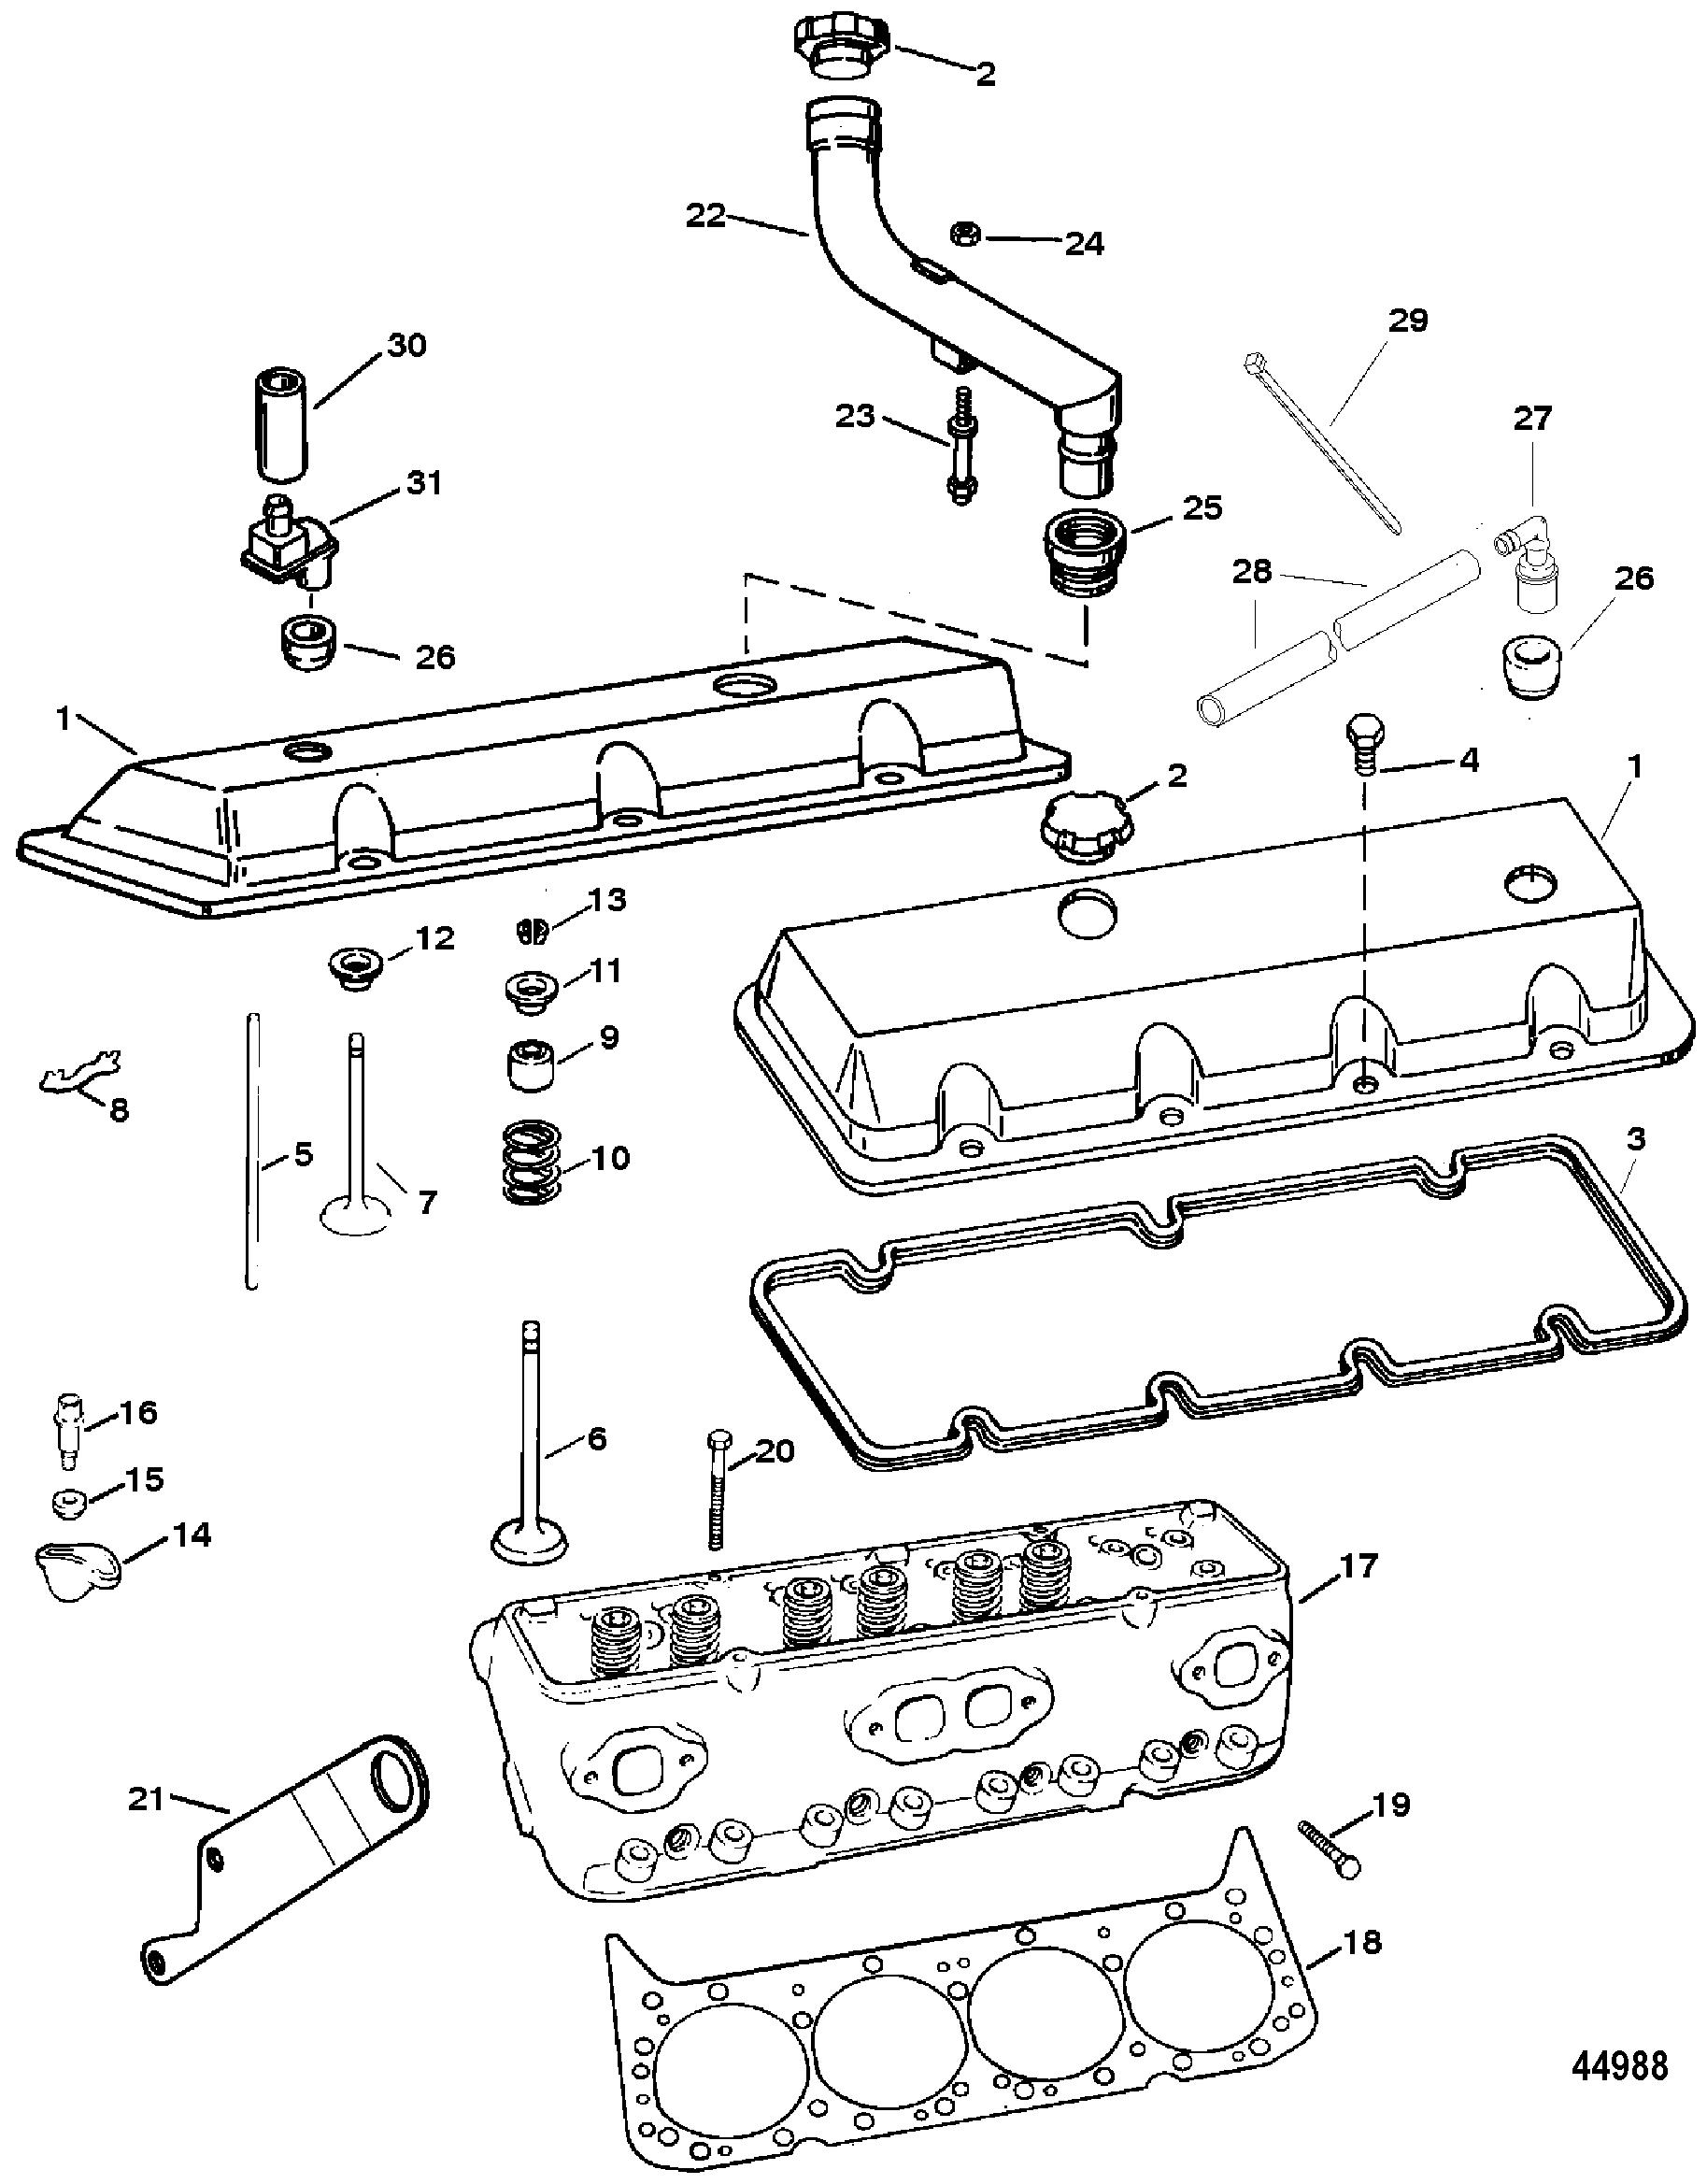 44988  Mercruiser Engine Wiring Diagram on mercruiser 888 serial number, mercruiser 888 solenoid, mercruiser 888 controls, mercruiser 888 exhaust system, mercruiser 888 distributor,